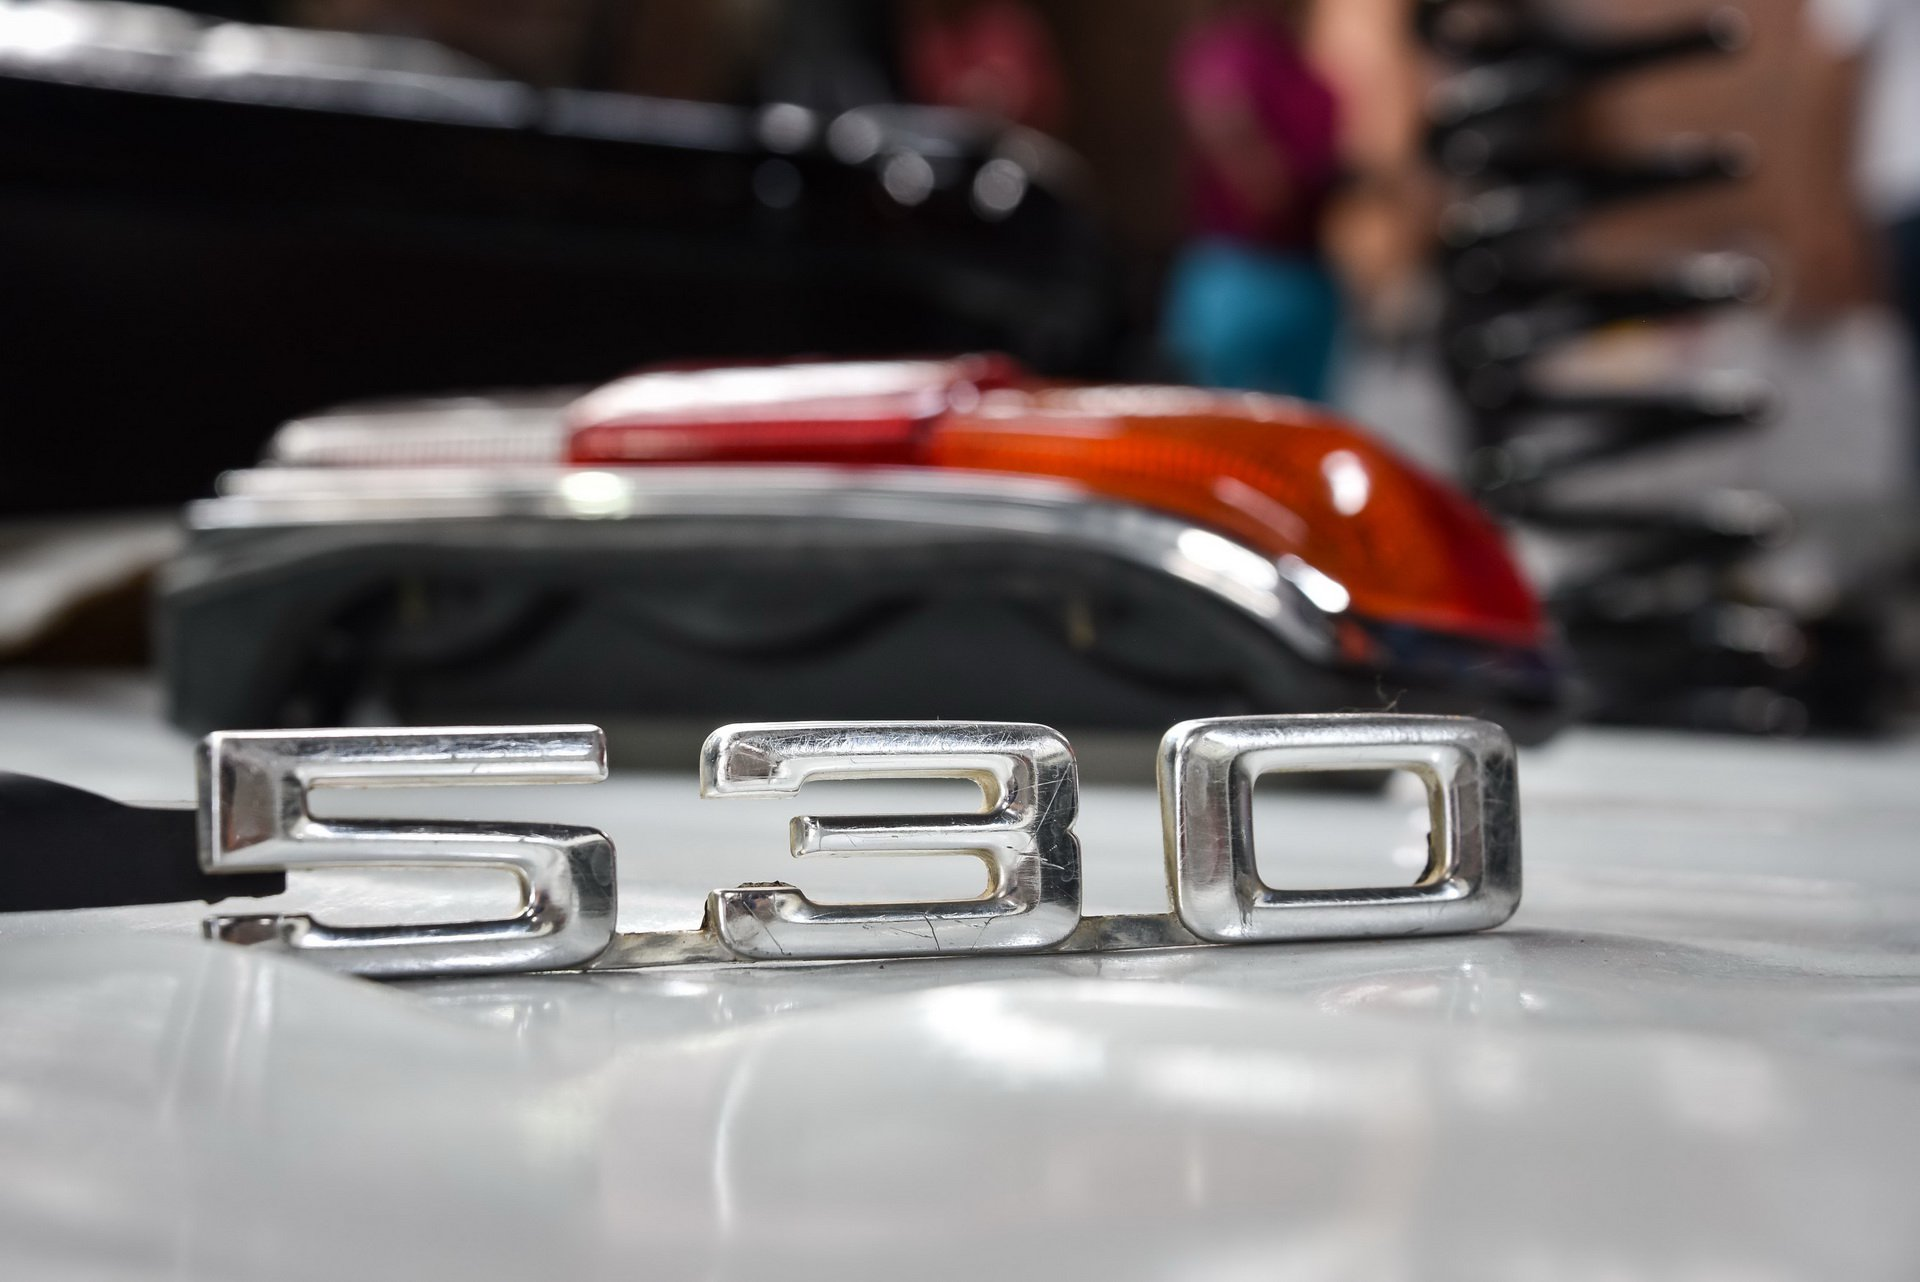 BMW-530-MLE-Restoration-process-149